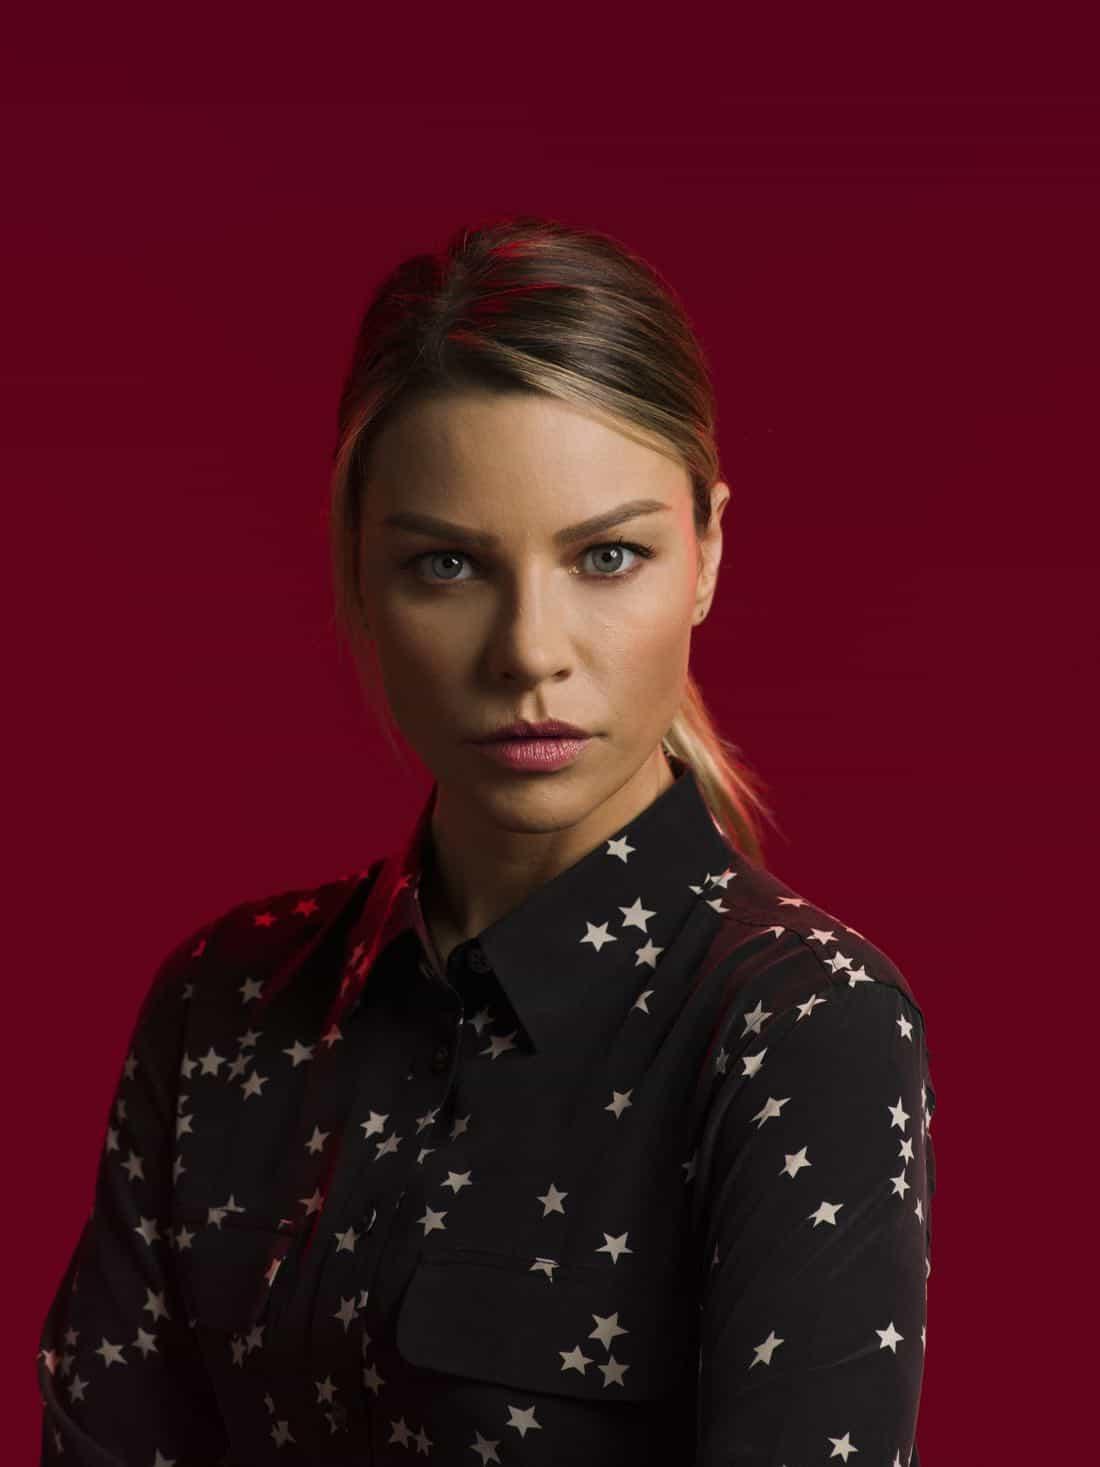 LUCIFER: Season 3 of LUCIFER premieres Monday, Oct. 2 on FOX. Lauren German. ©2017 Fox Broadcasting Co. CR: Jason Bell/FOX